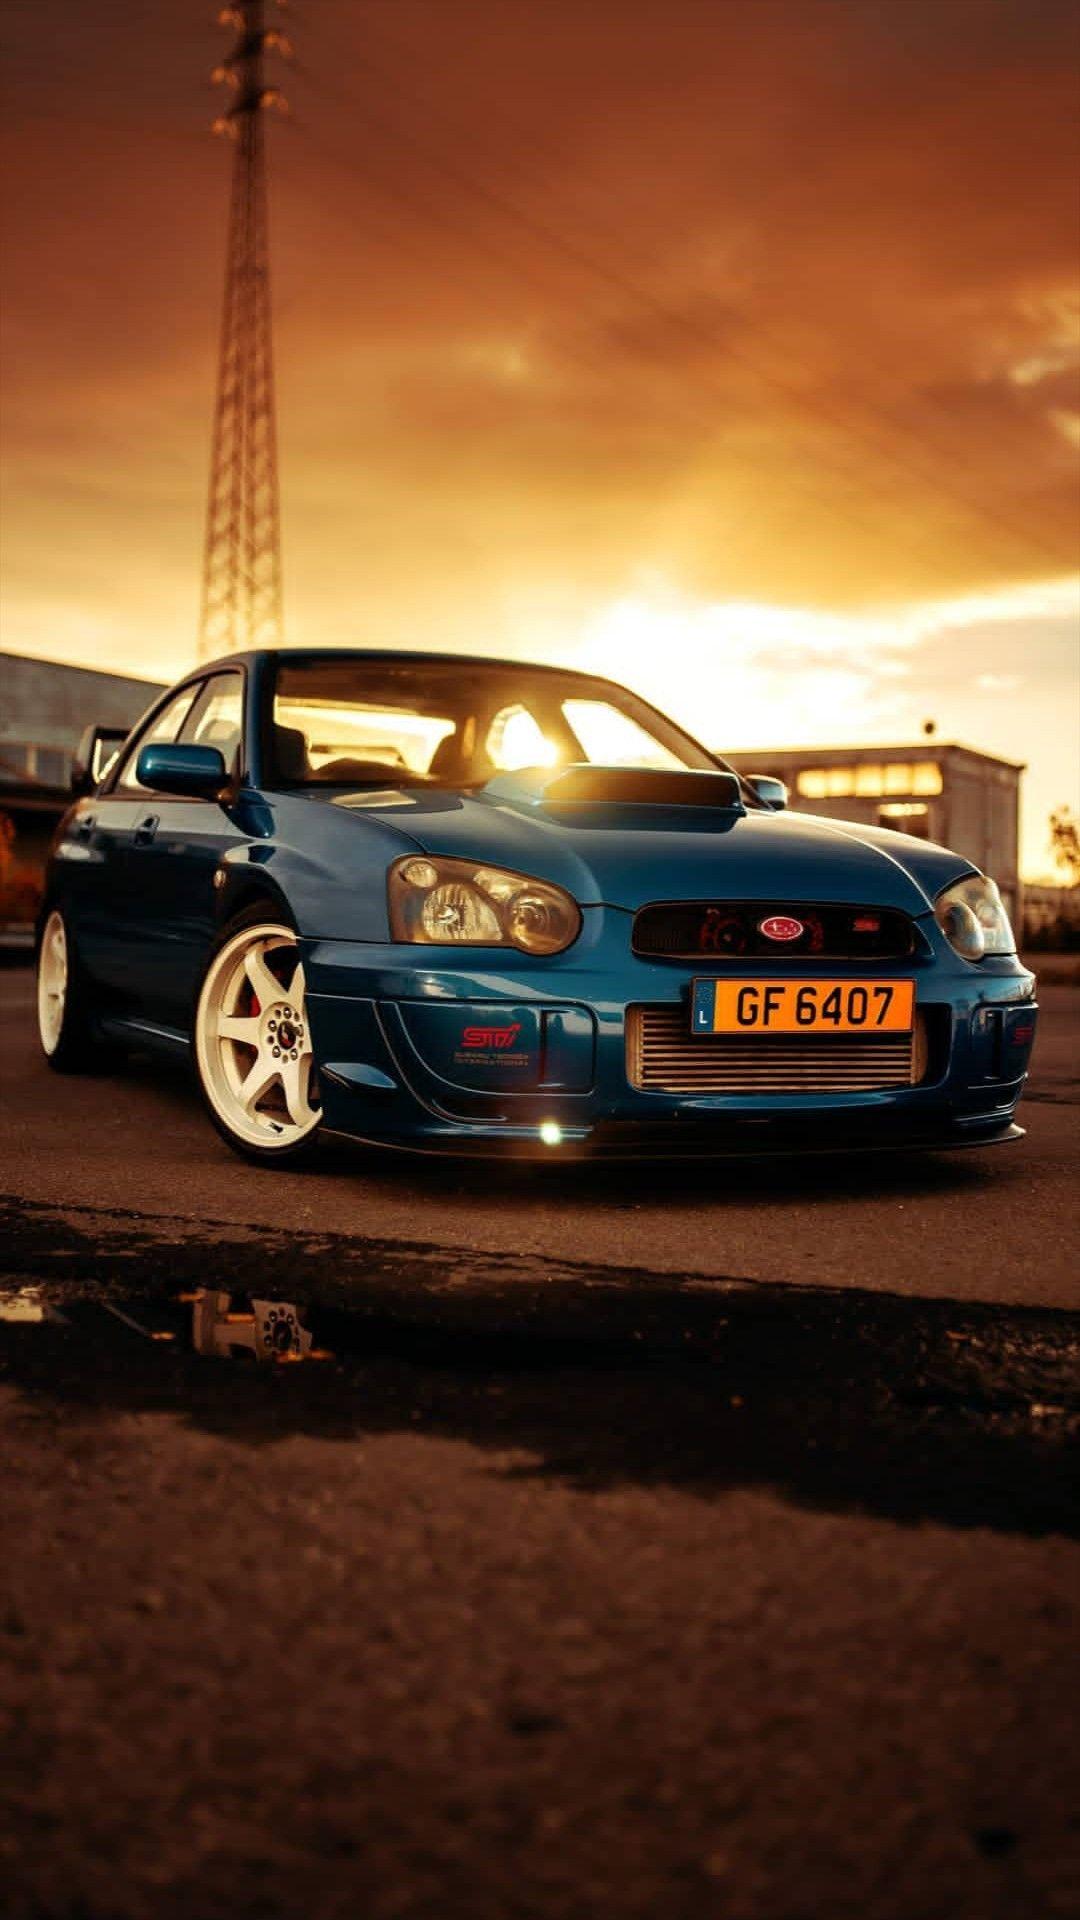 Dream Cars Subaru Cars Subaru Wrx Sti Japanese Sports Cars